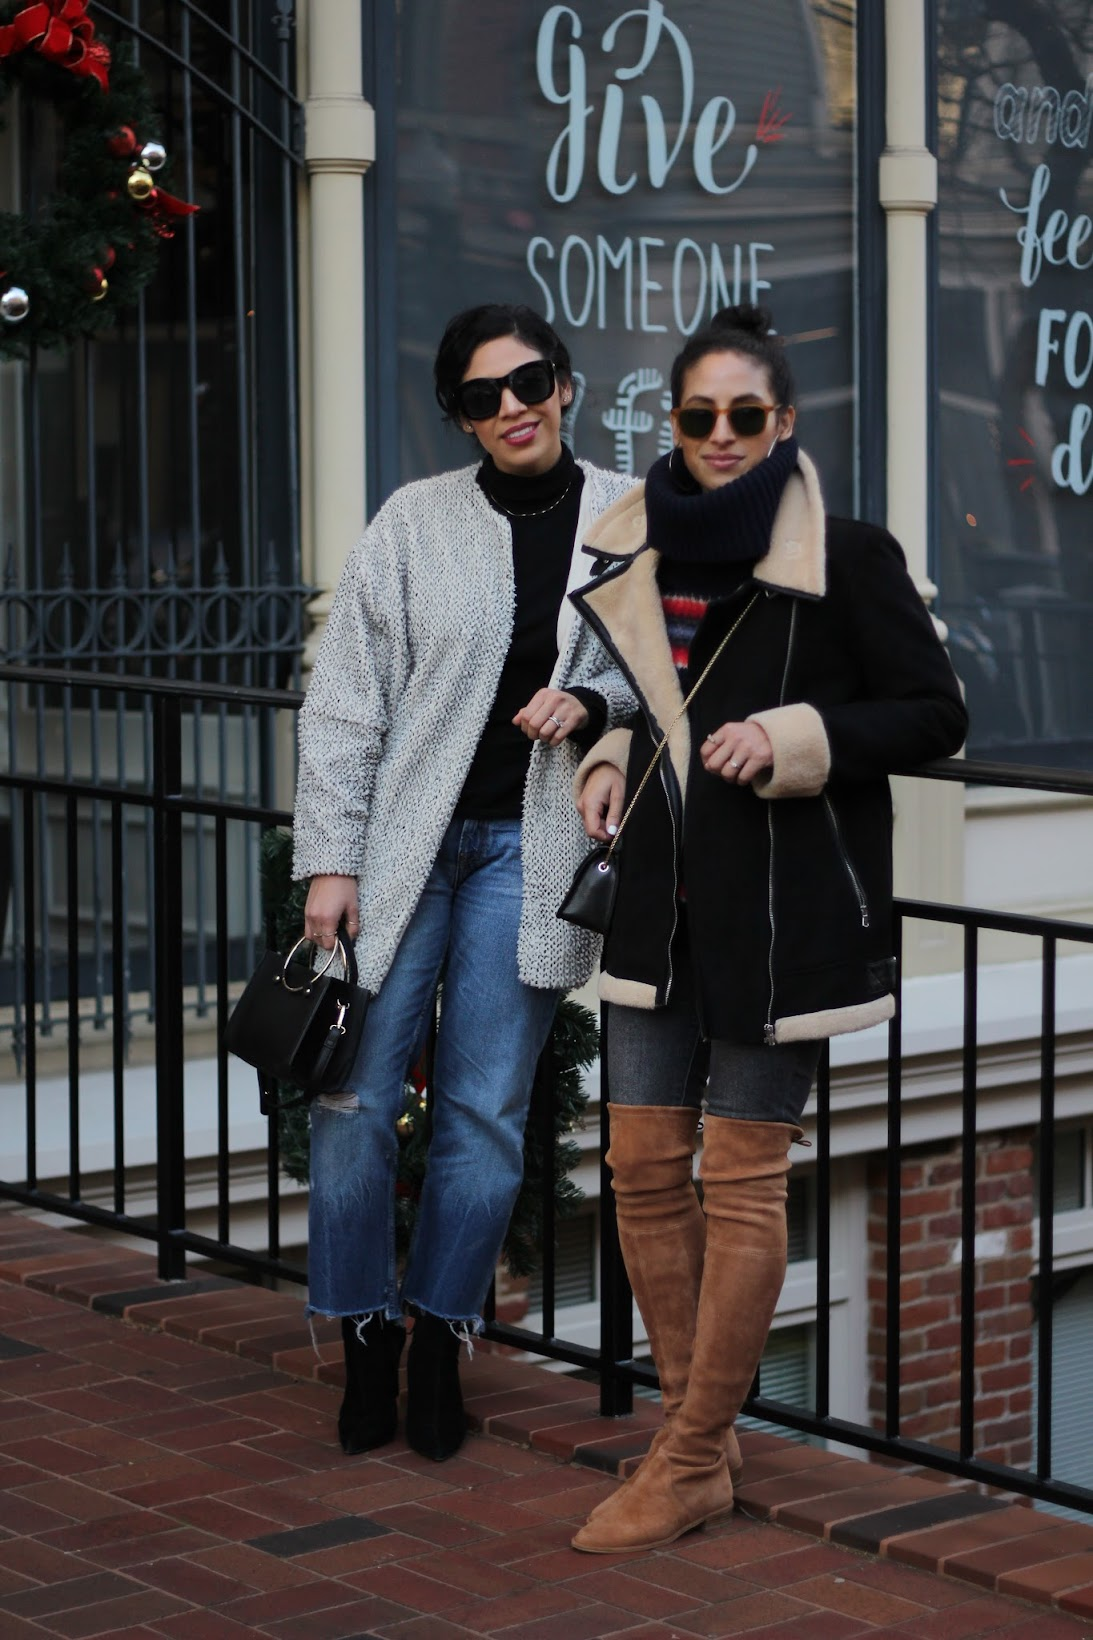 blogger besties, daisy's fashion garden, zara winter style, Furla crossbody, garrett leight sunglasses, how to look chic this winter, SF bloggers, Stuart Weitzman boots, NYFW